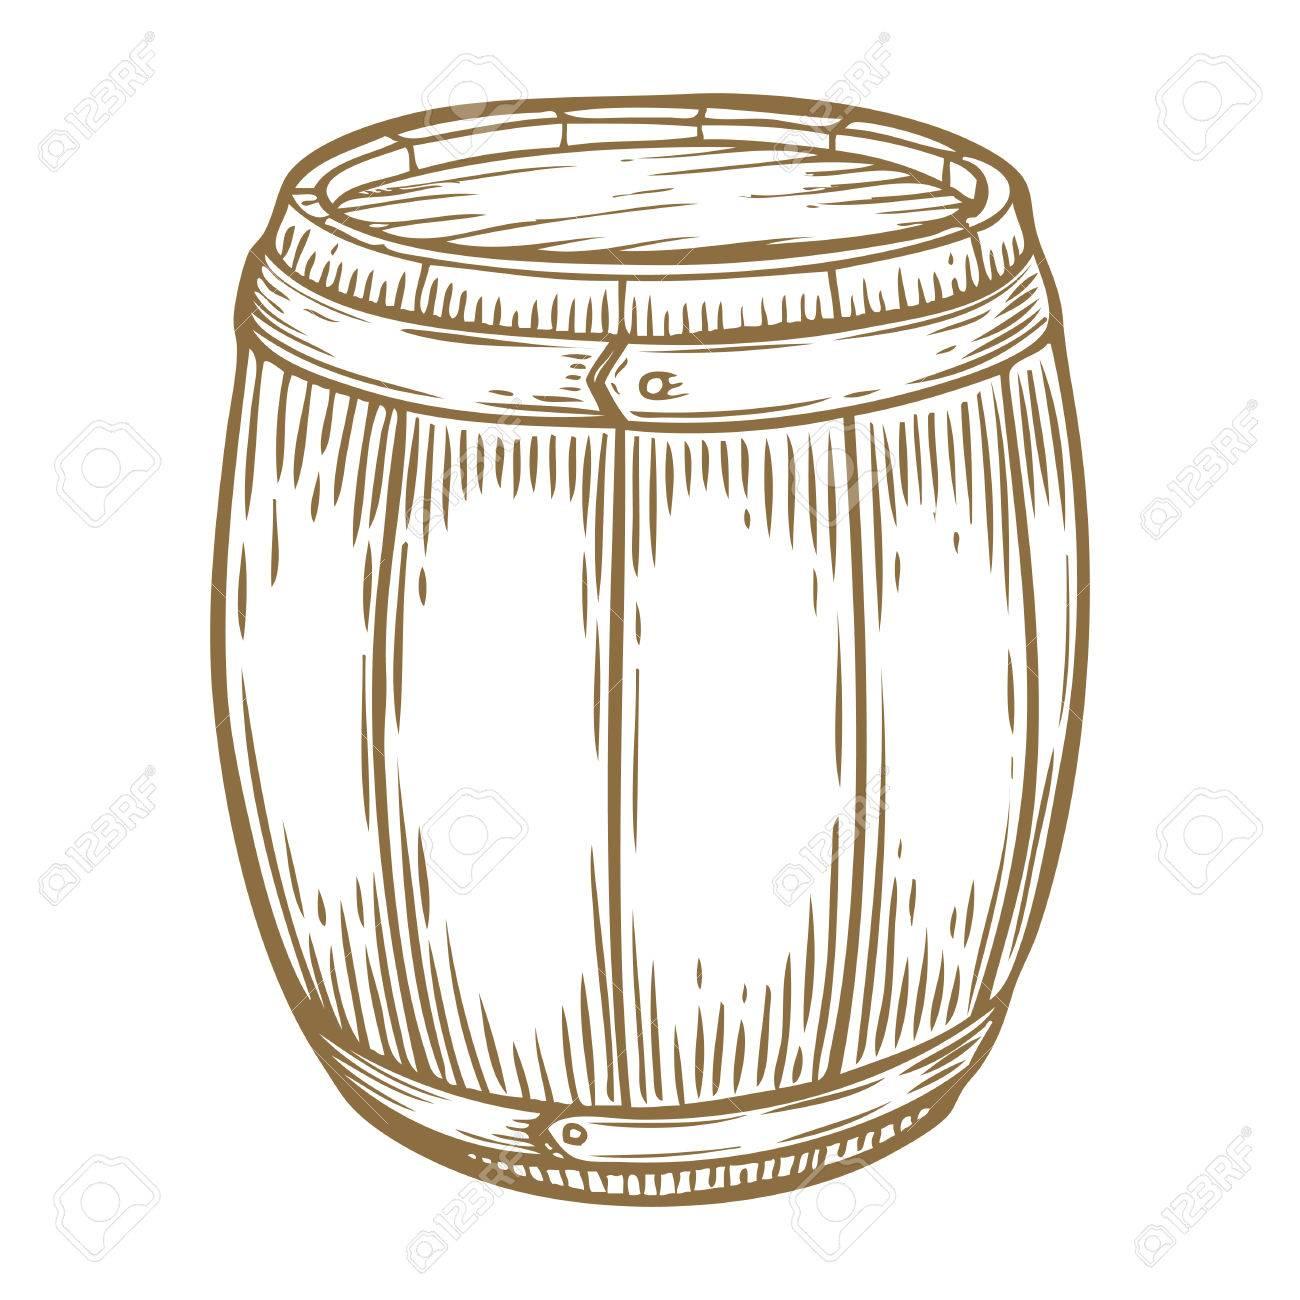 1300x1300 Wooden Craft Beer, Whiskey, Wine Alcohol Barrel. Brown Vintage